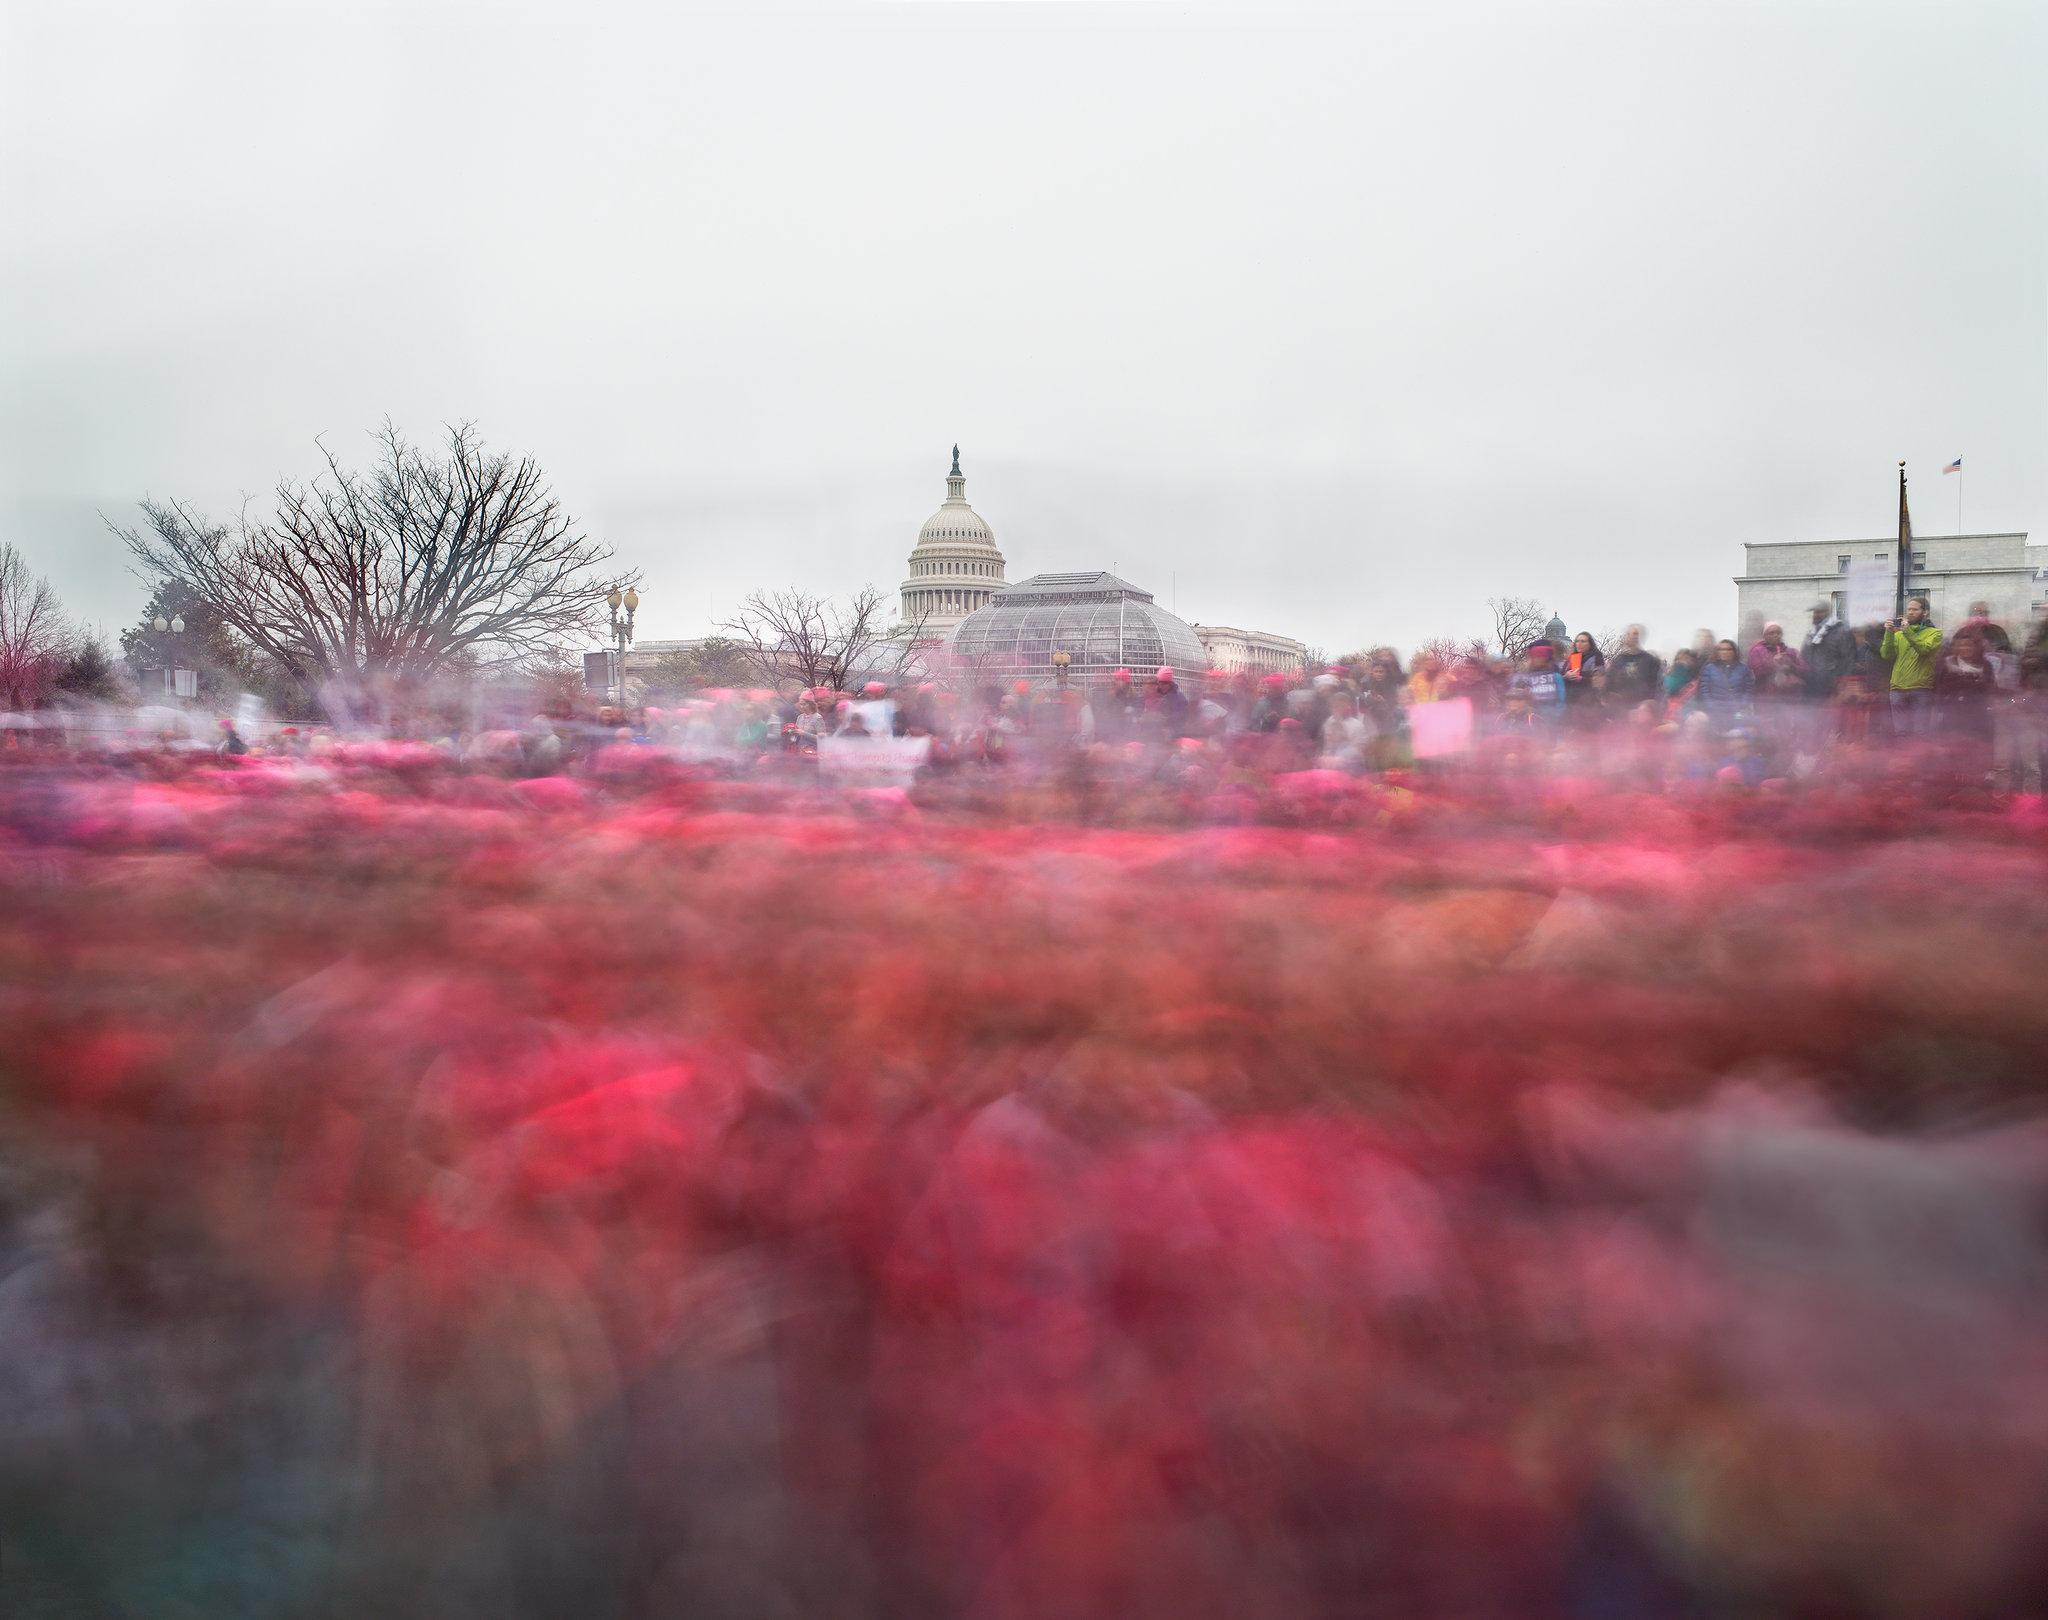 Women's March on Washington, Jan. 21, 2017.Credit: Matthew Pillsbury for The New York Times